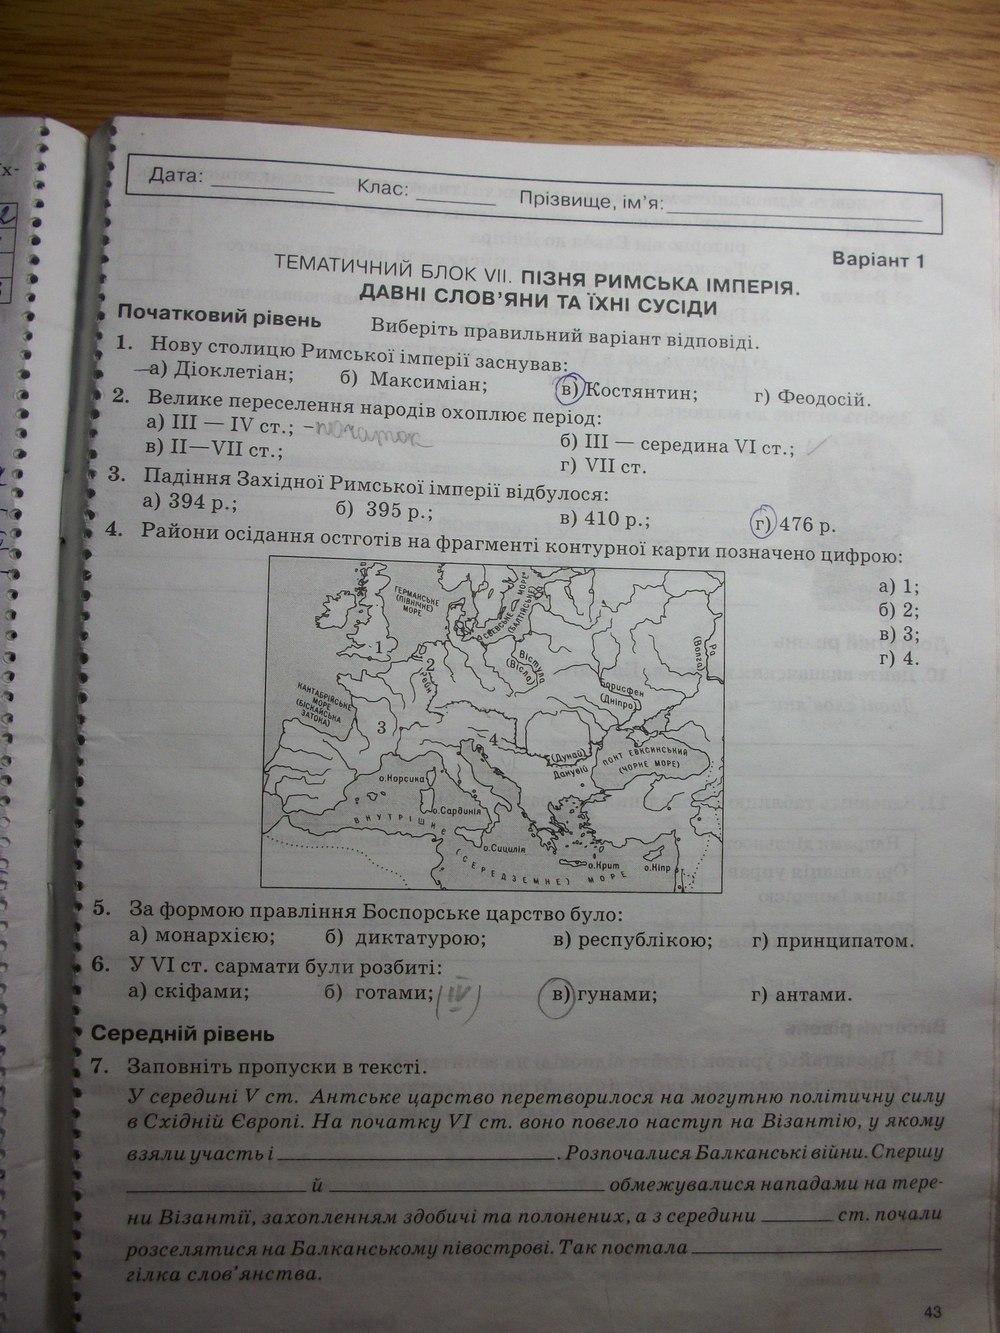 ГДЗ рабочие тетради 6 класс. Задание: стр. 43